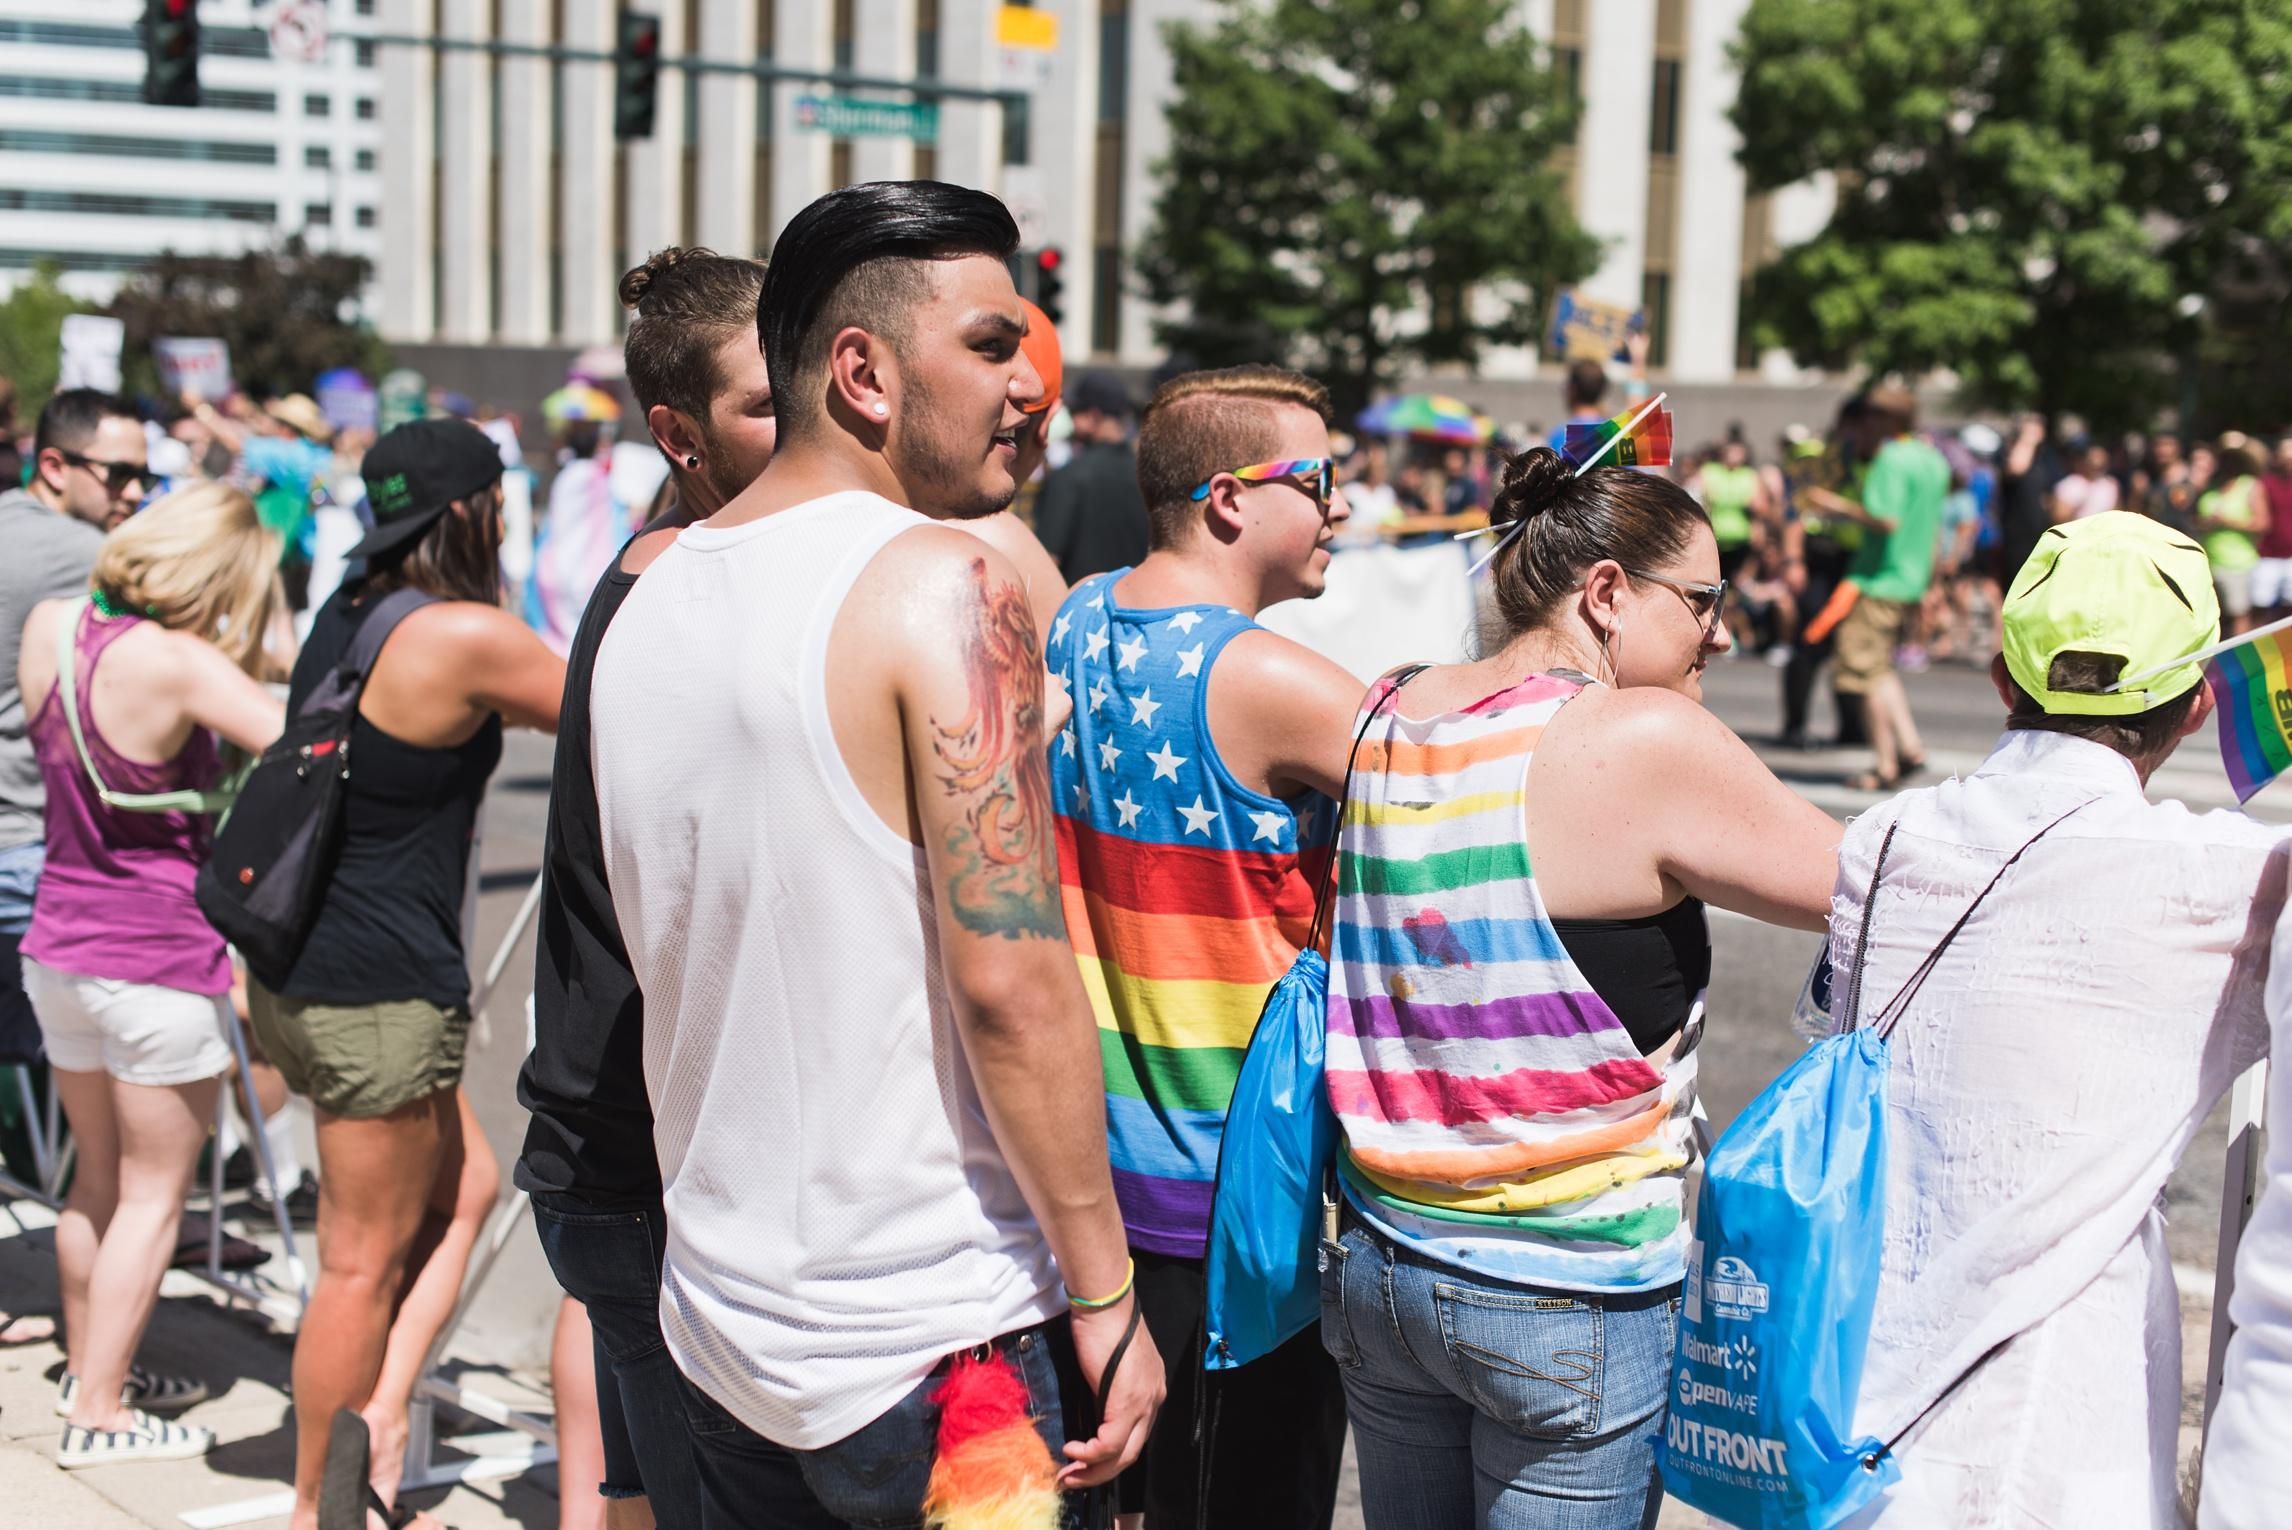 The pride parade in Denver, Colorado. Photography by Sonja Salzburg of Sonja K Photography.